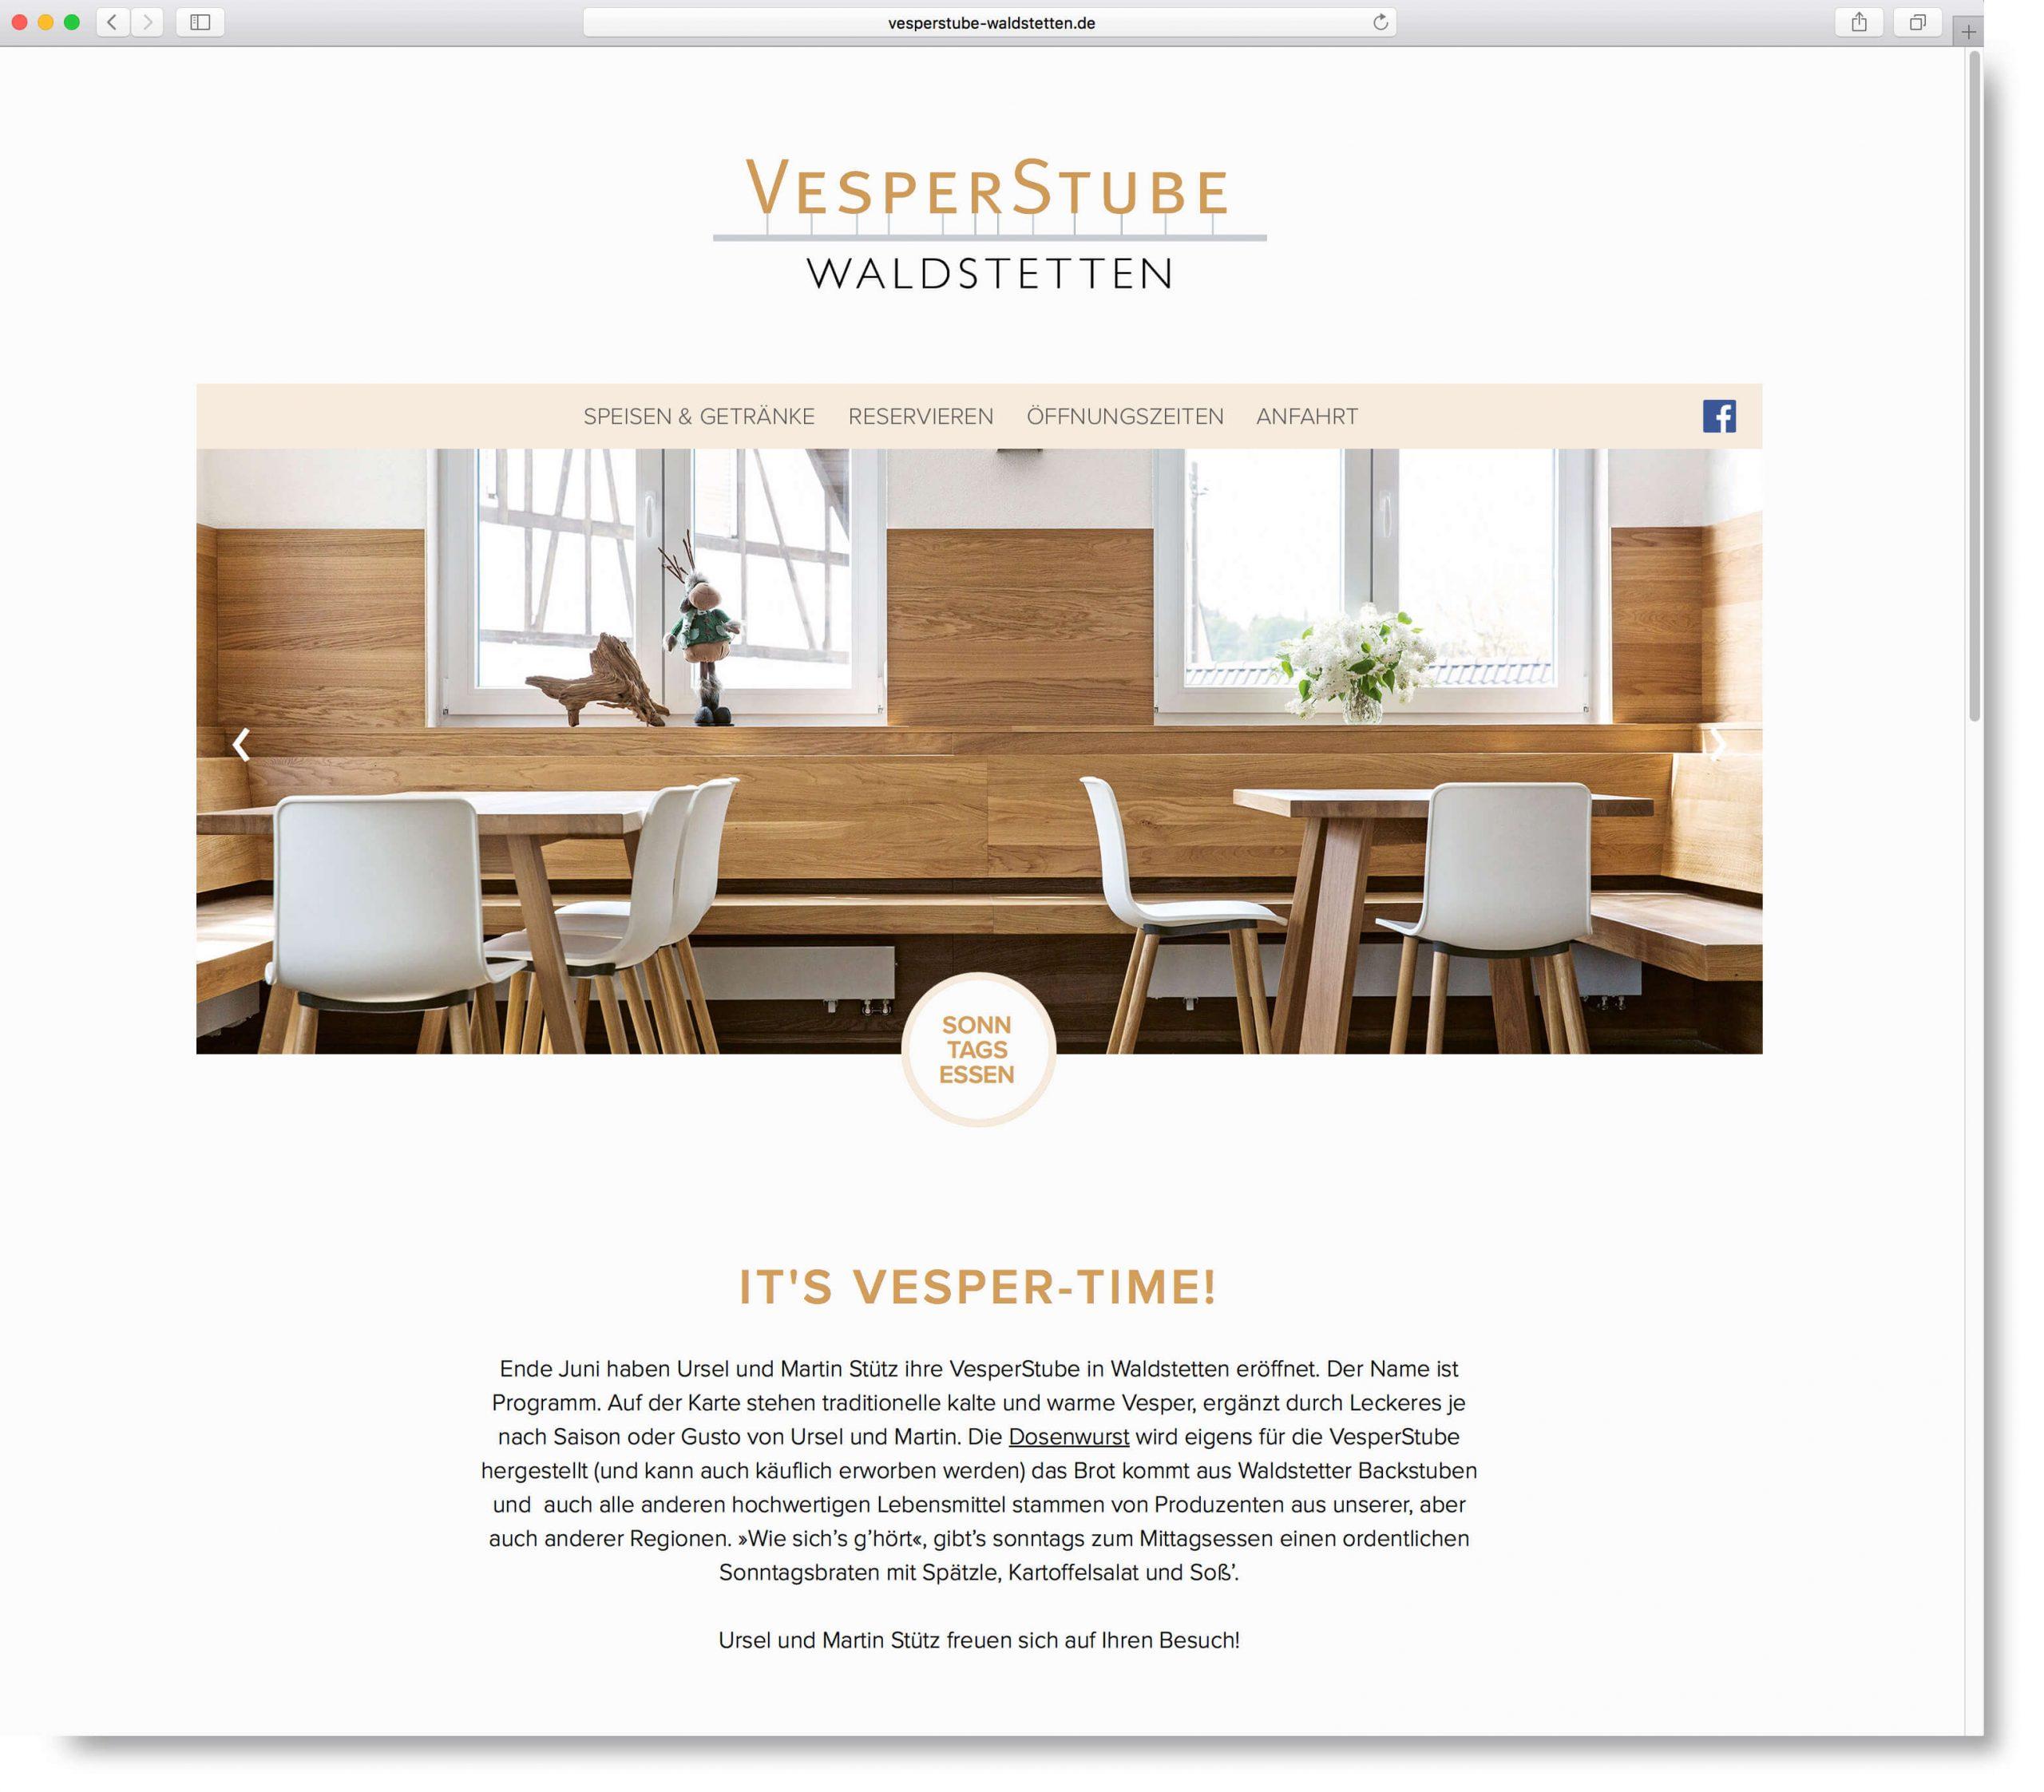 fh-web-vesperstube-website-scaled.jpg